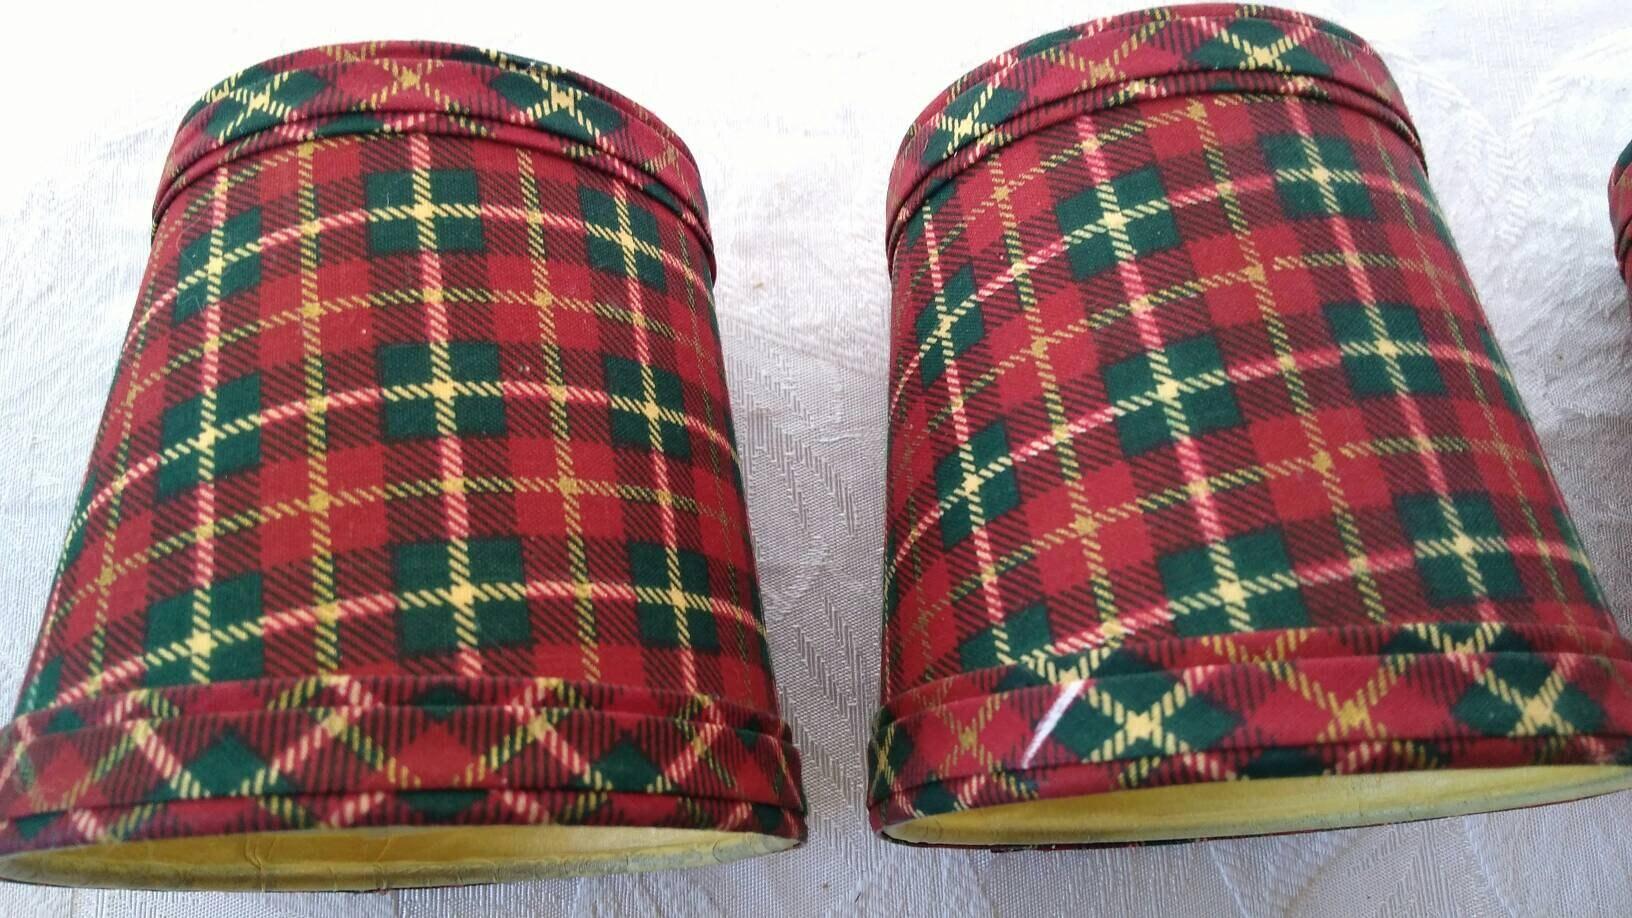 Set of 4 matching plaid tartan chandelier shades red black green yellow tartan chandelier shades red black green yellow gallery photo gallery photo arubaitofo Choice Image